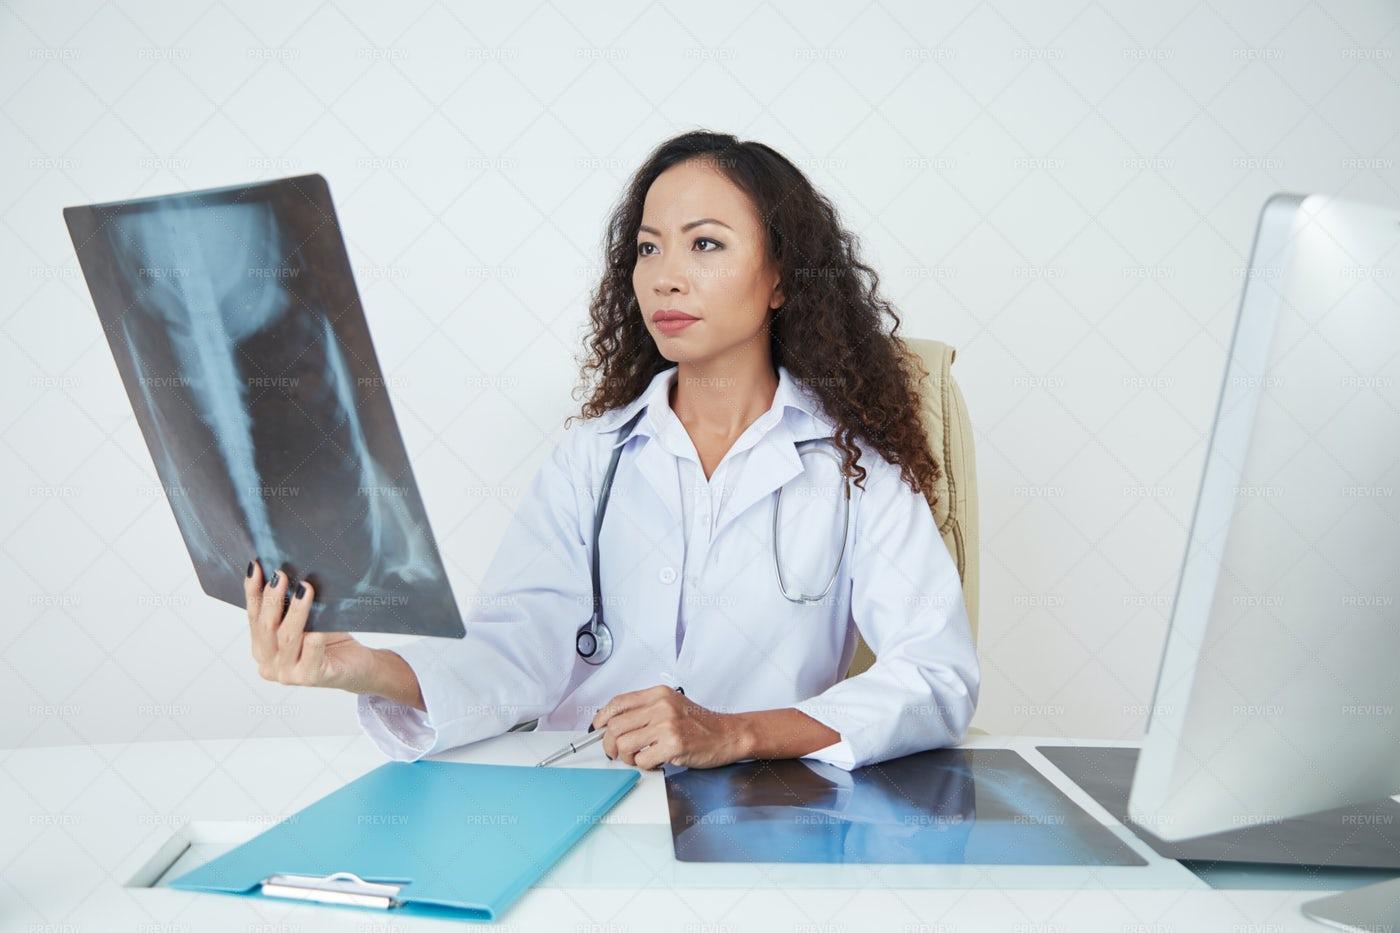 Doctor Examining Chest X-ray: Stock Photos